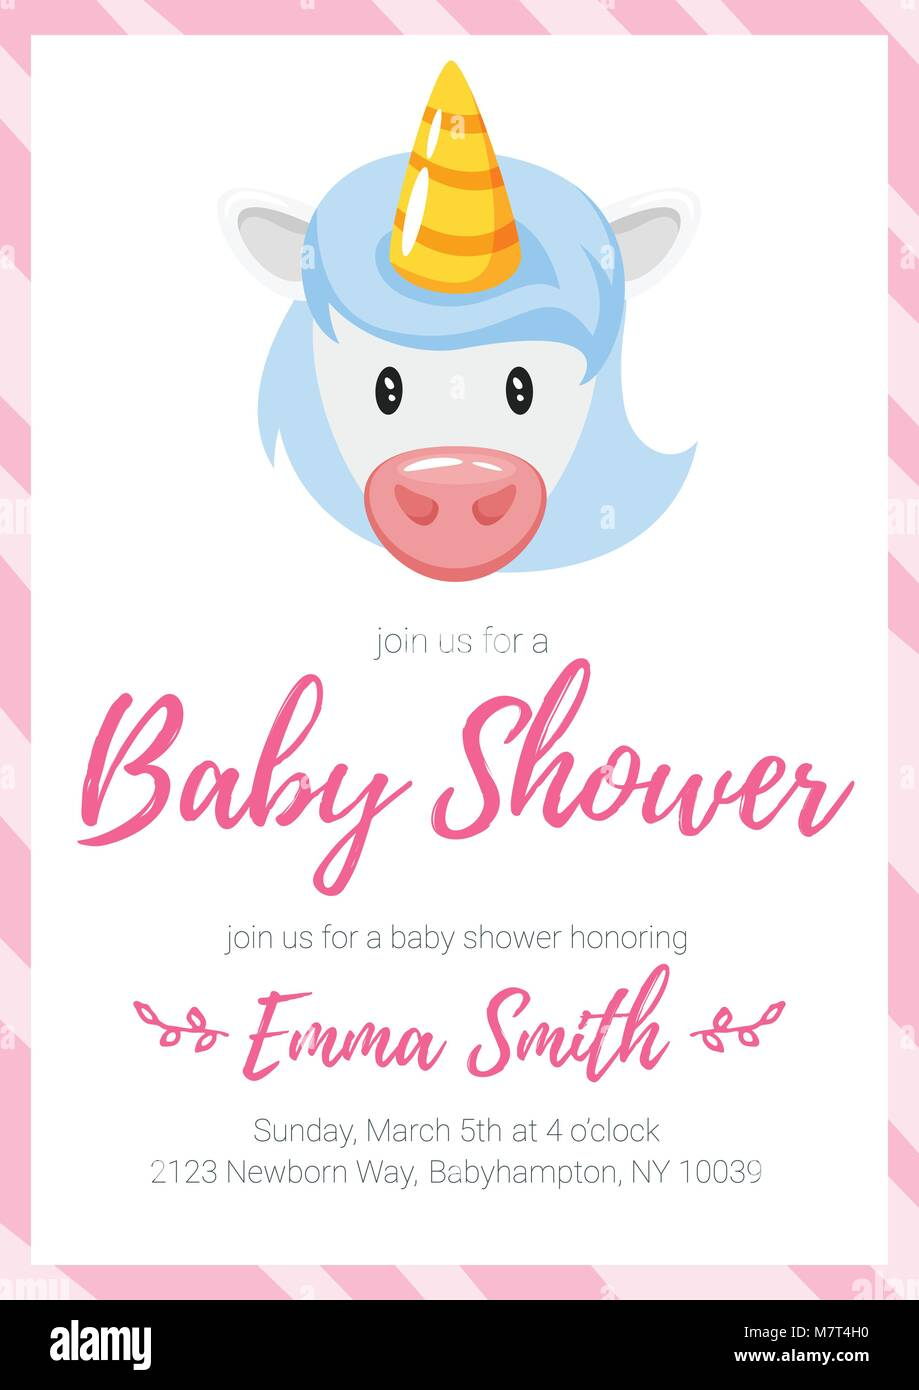 Vector Cartoon Style Illustration Of Baby Shower Invitation Baby